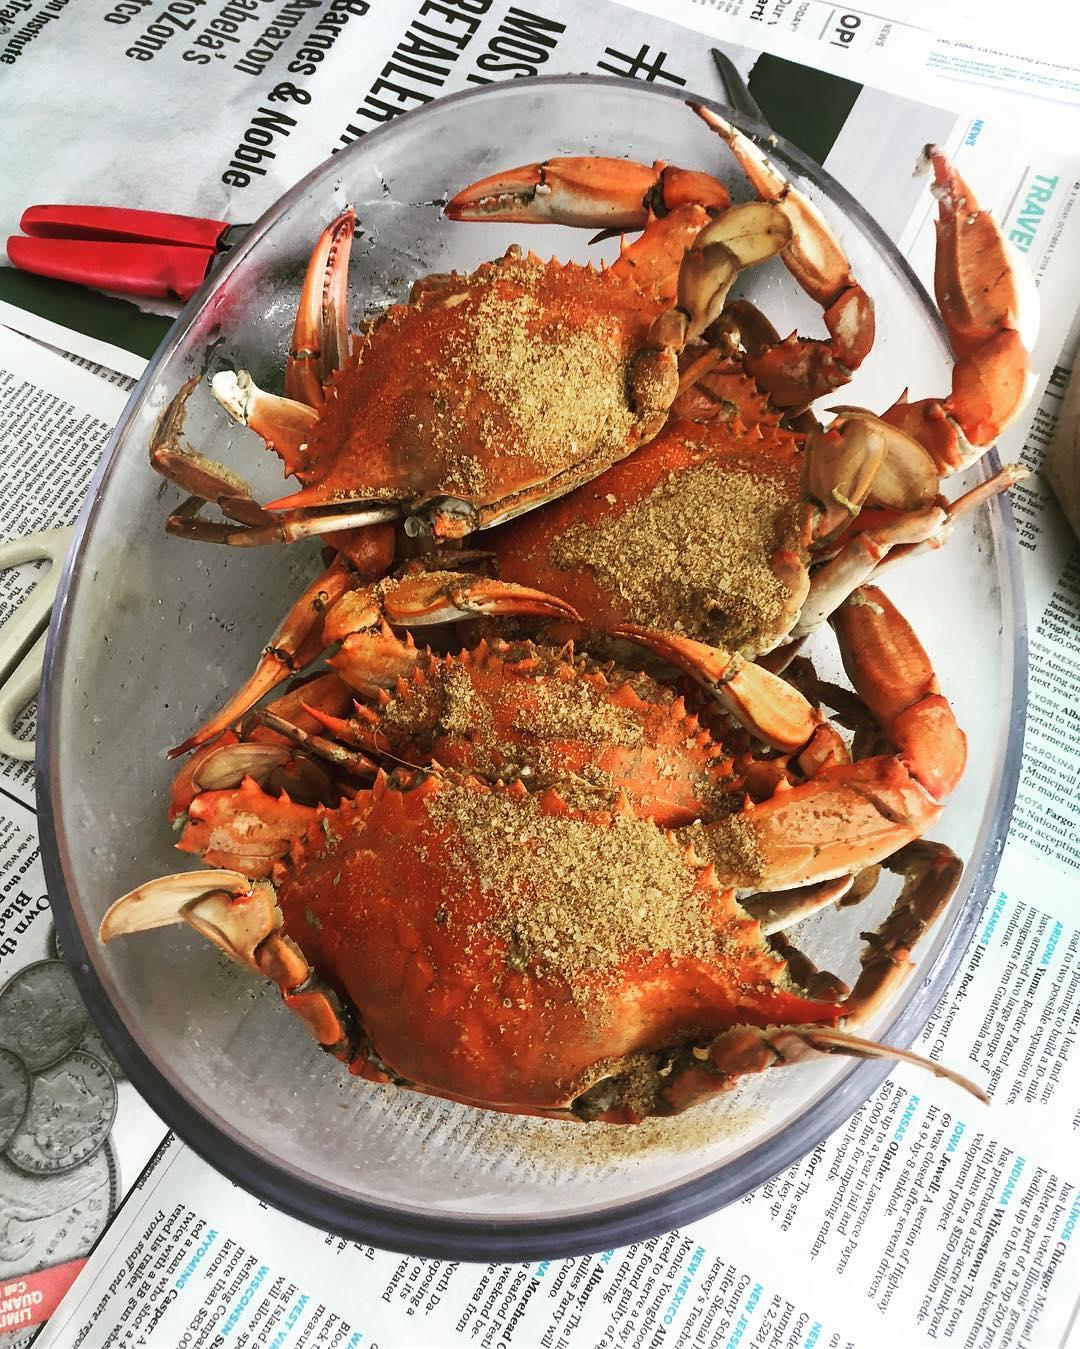 Hurricane crabs